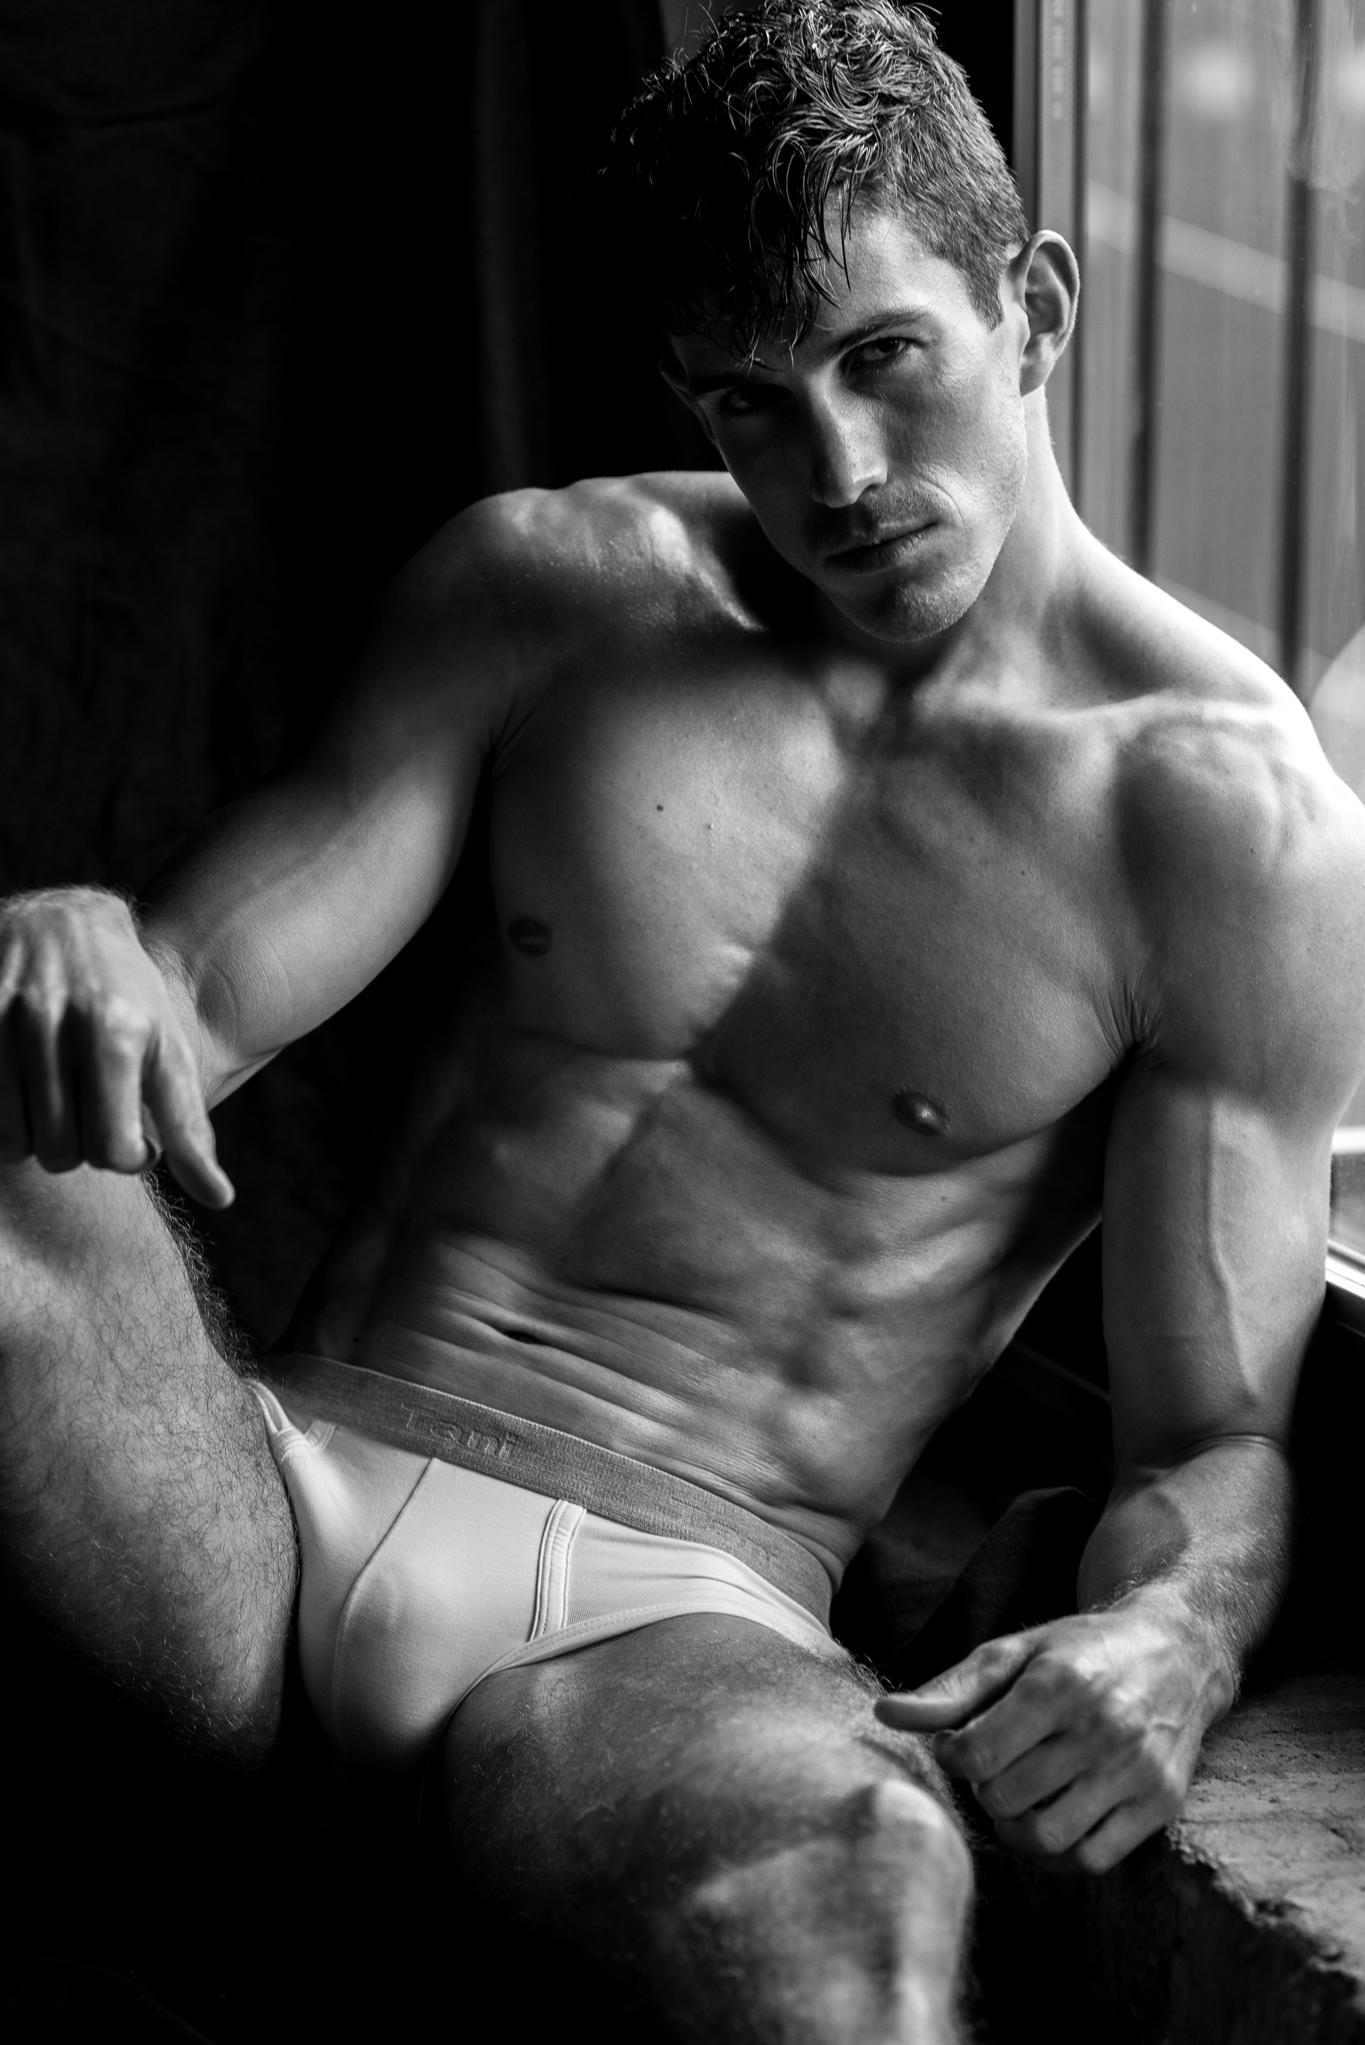 Adon Exclusive: Model KEVIN FOLEY By JONJIE BANIEL